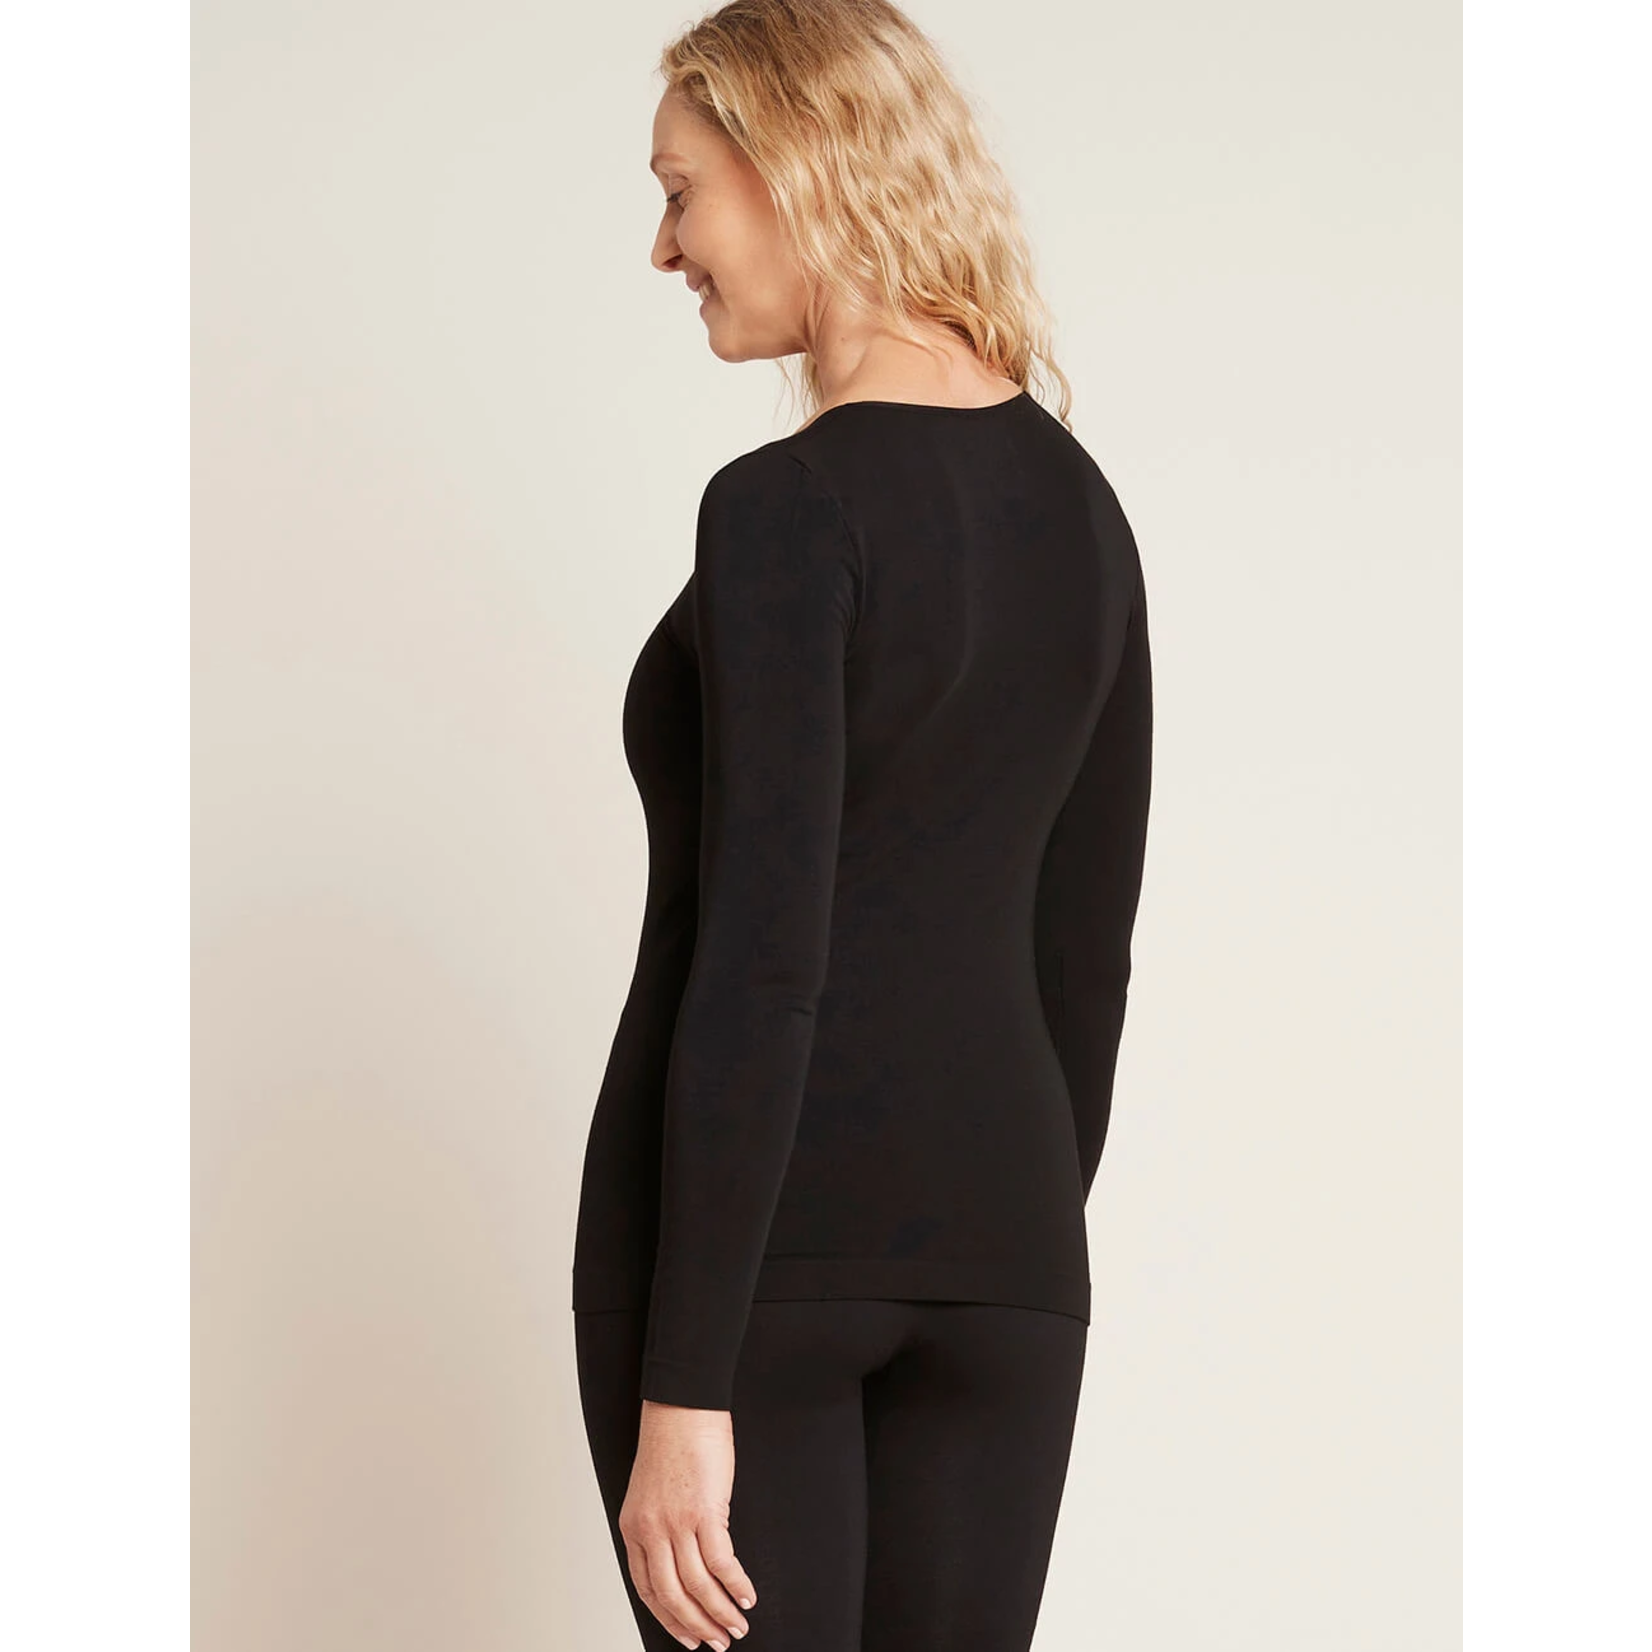 Boody Boody Women's Long Sleeve Top